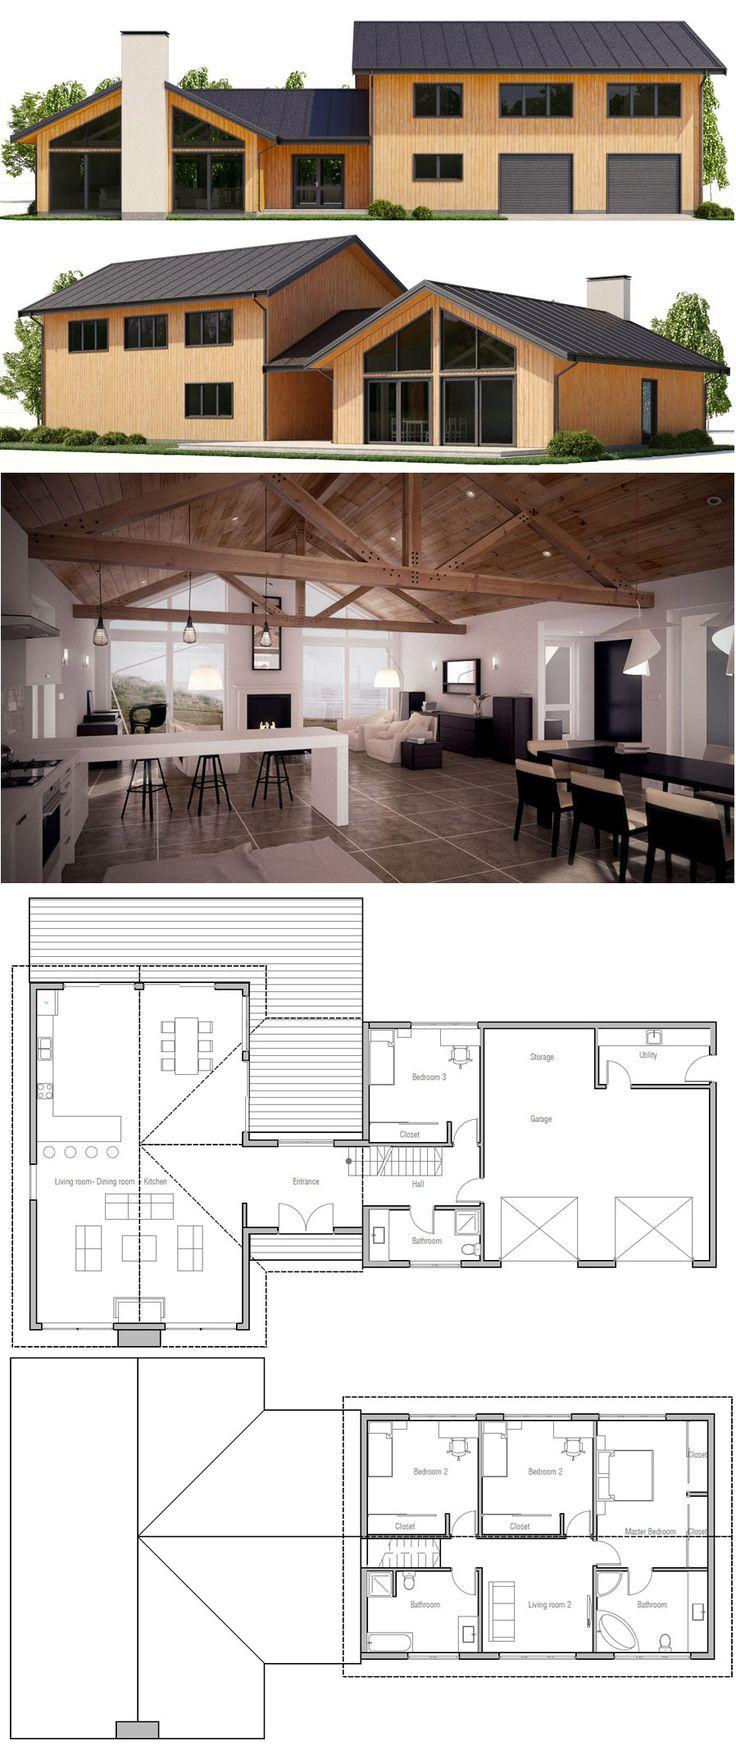 Home Plans 569 best Hzak images on